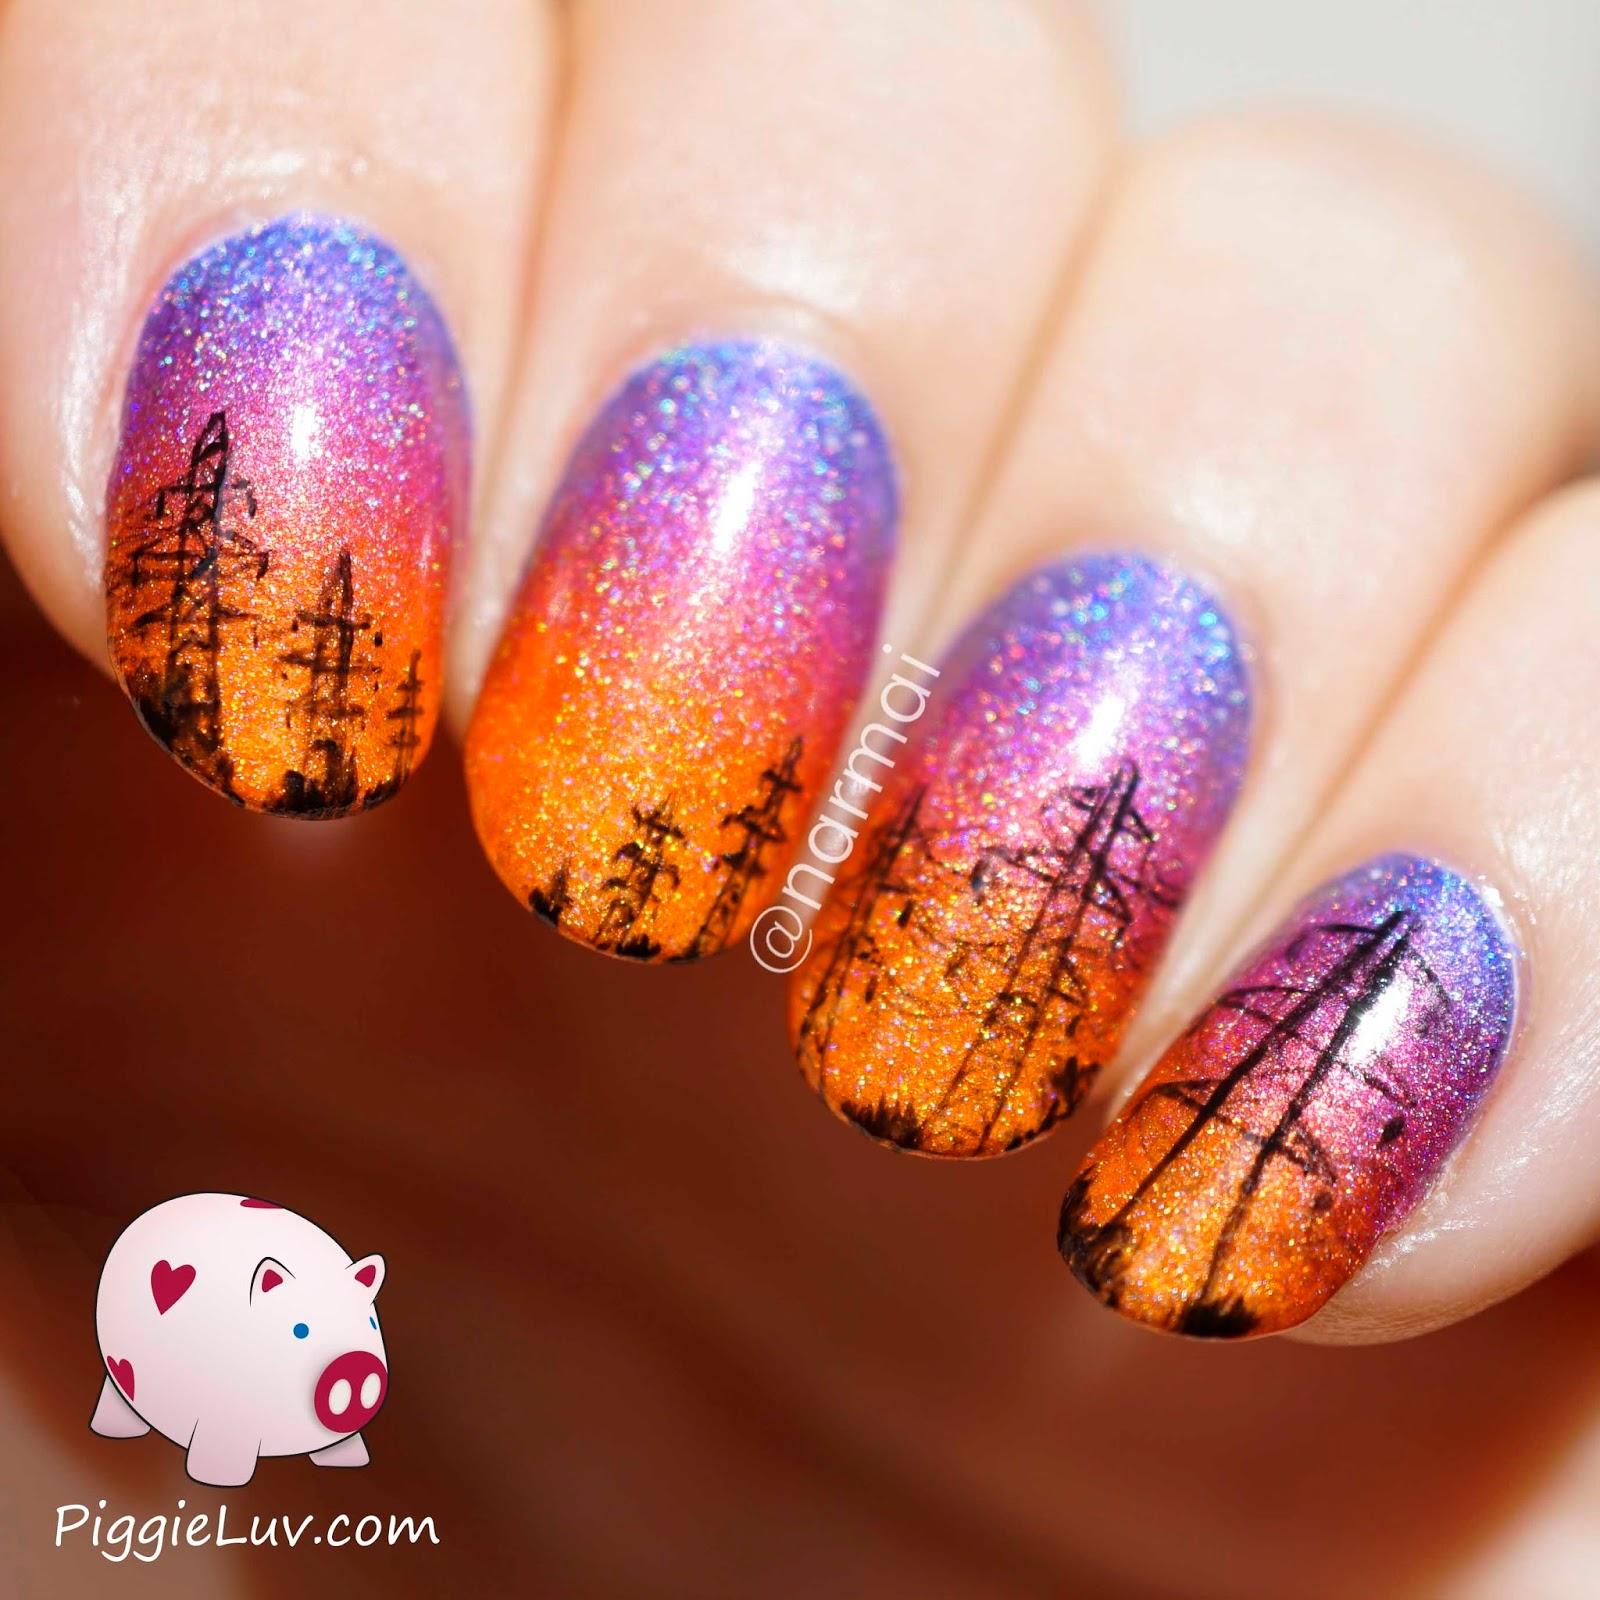 Single Line Nail Art : Piggieluv high voltage power lines nail art